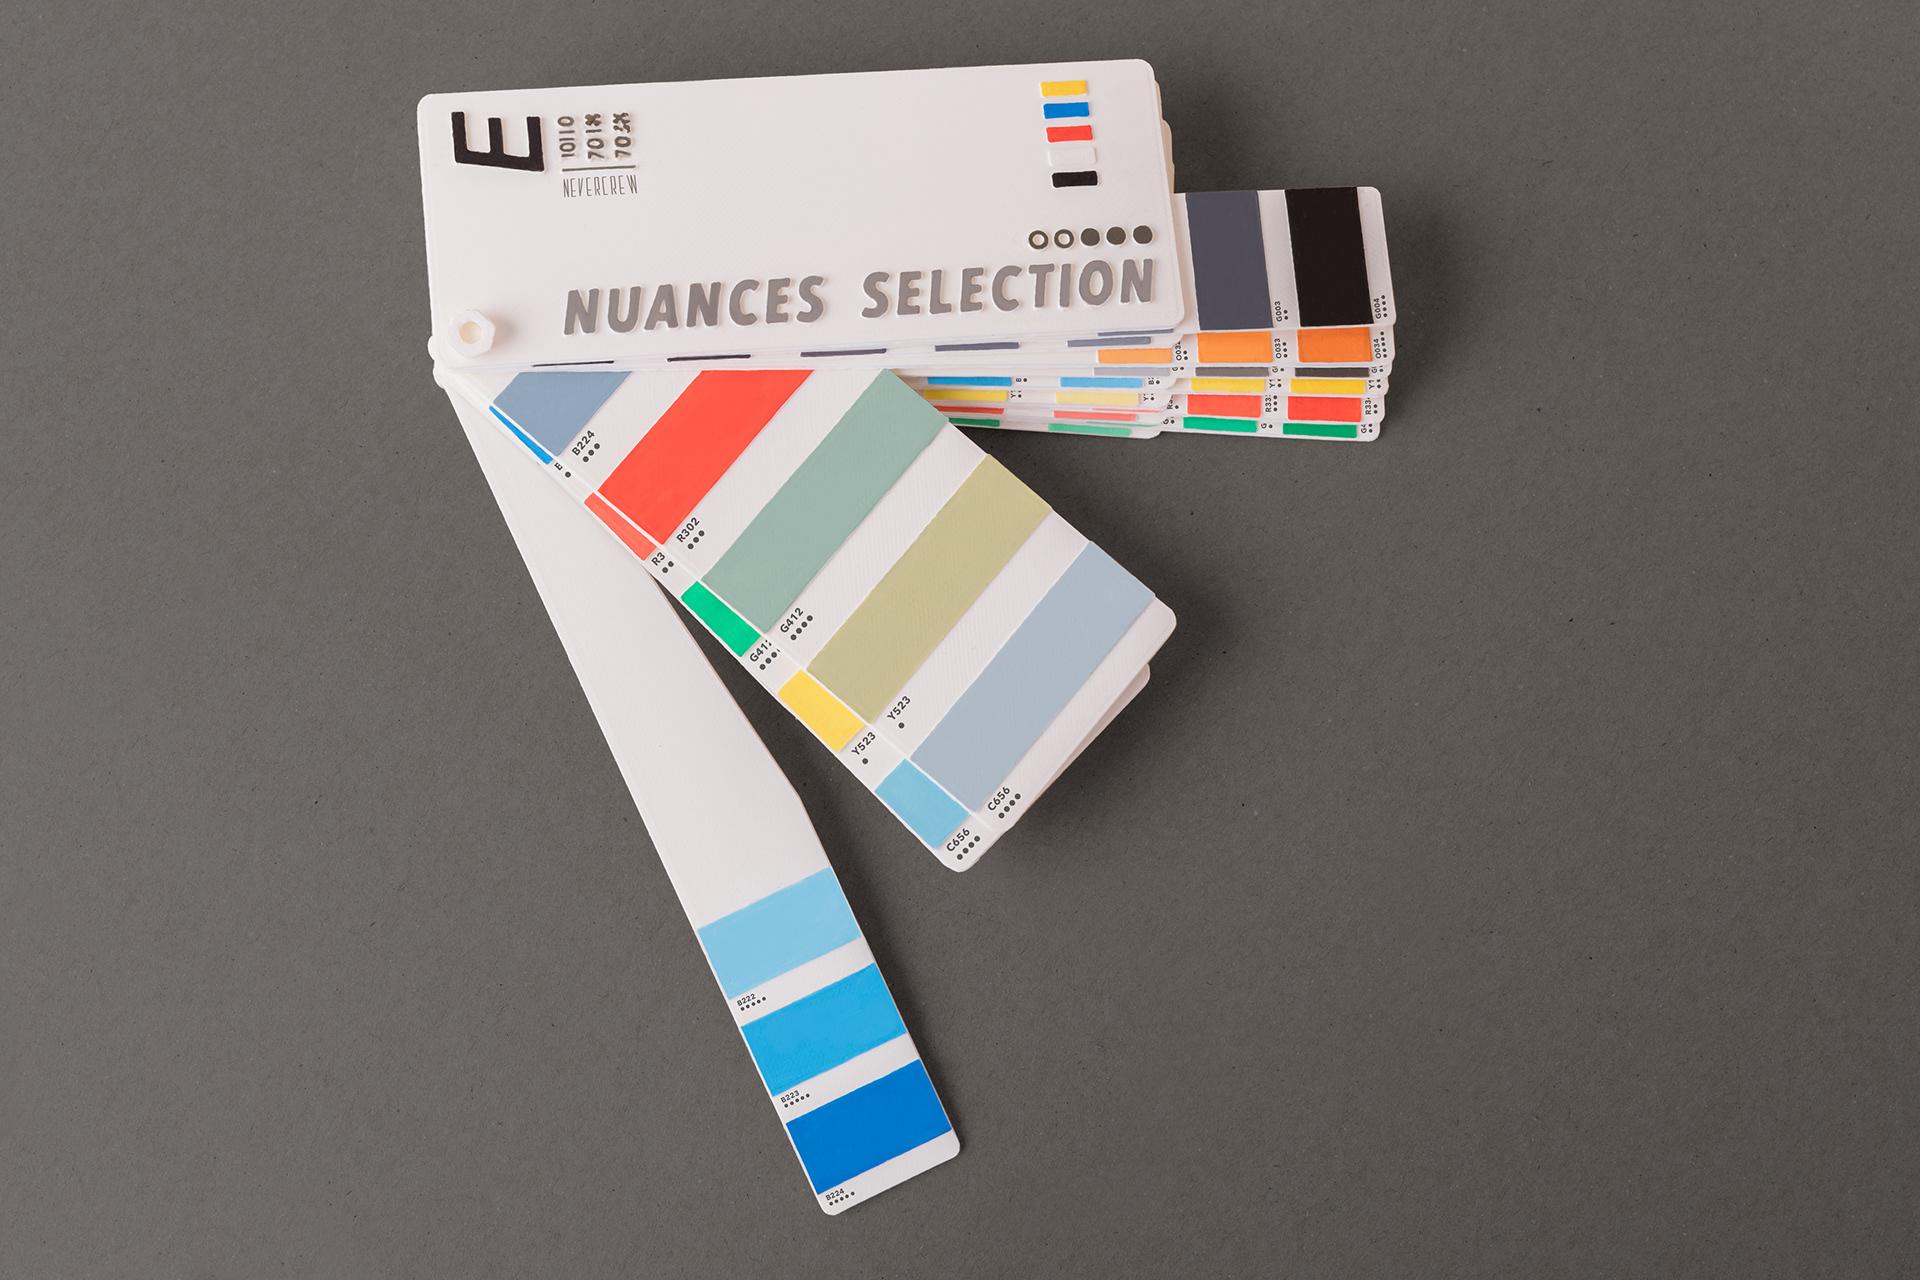 Nuances selection   Collater.al